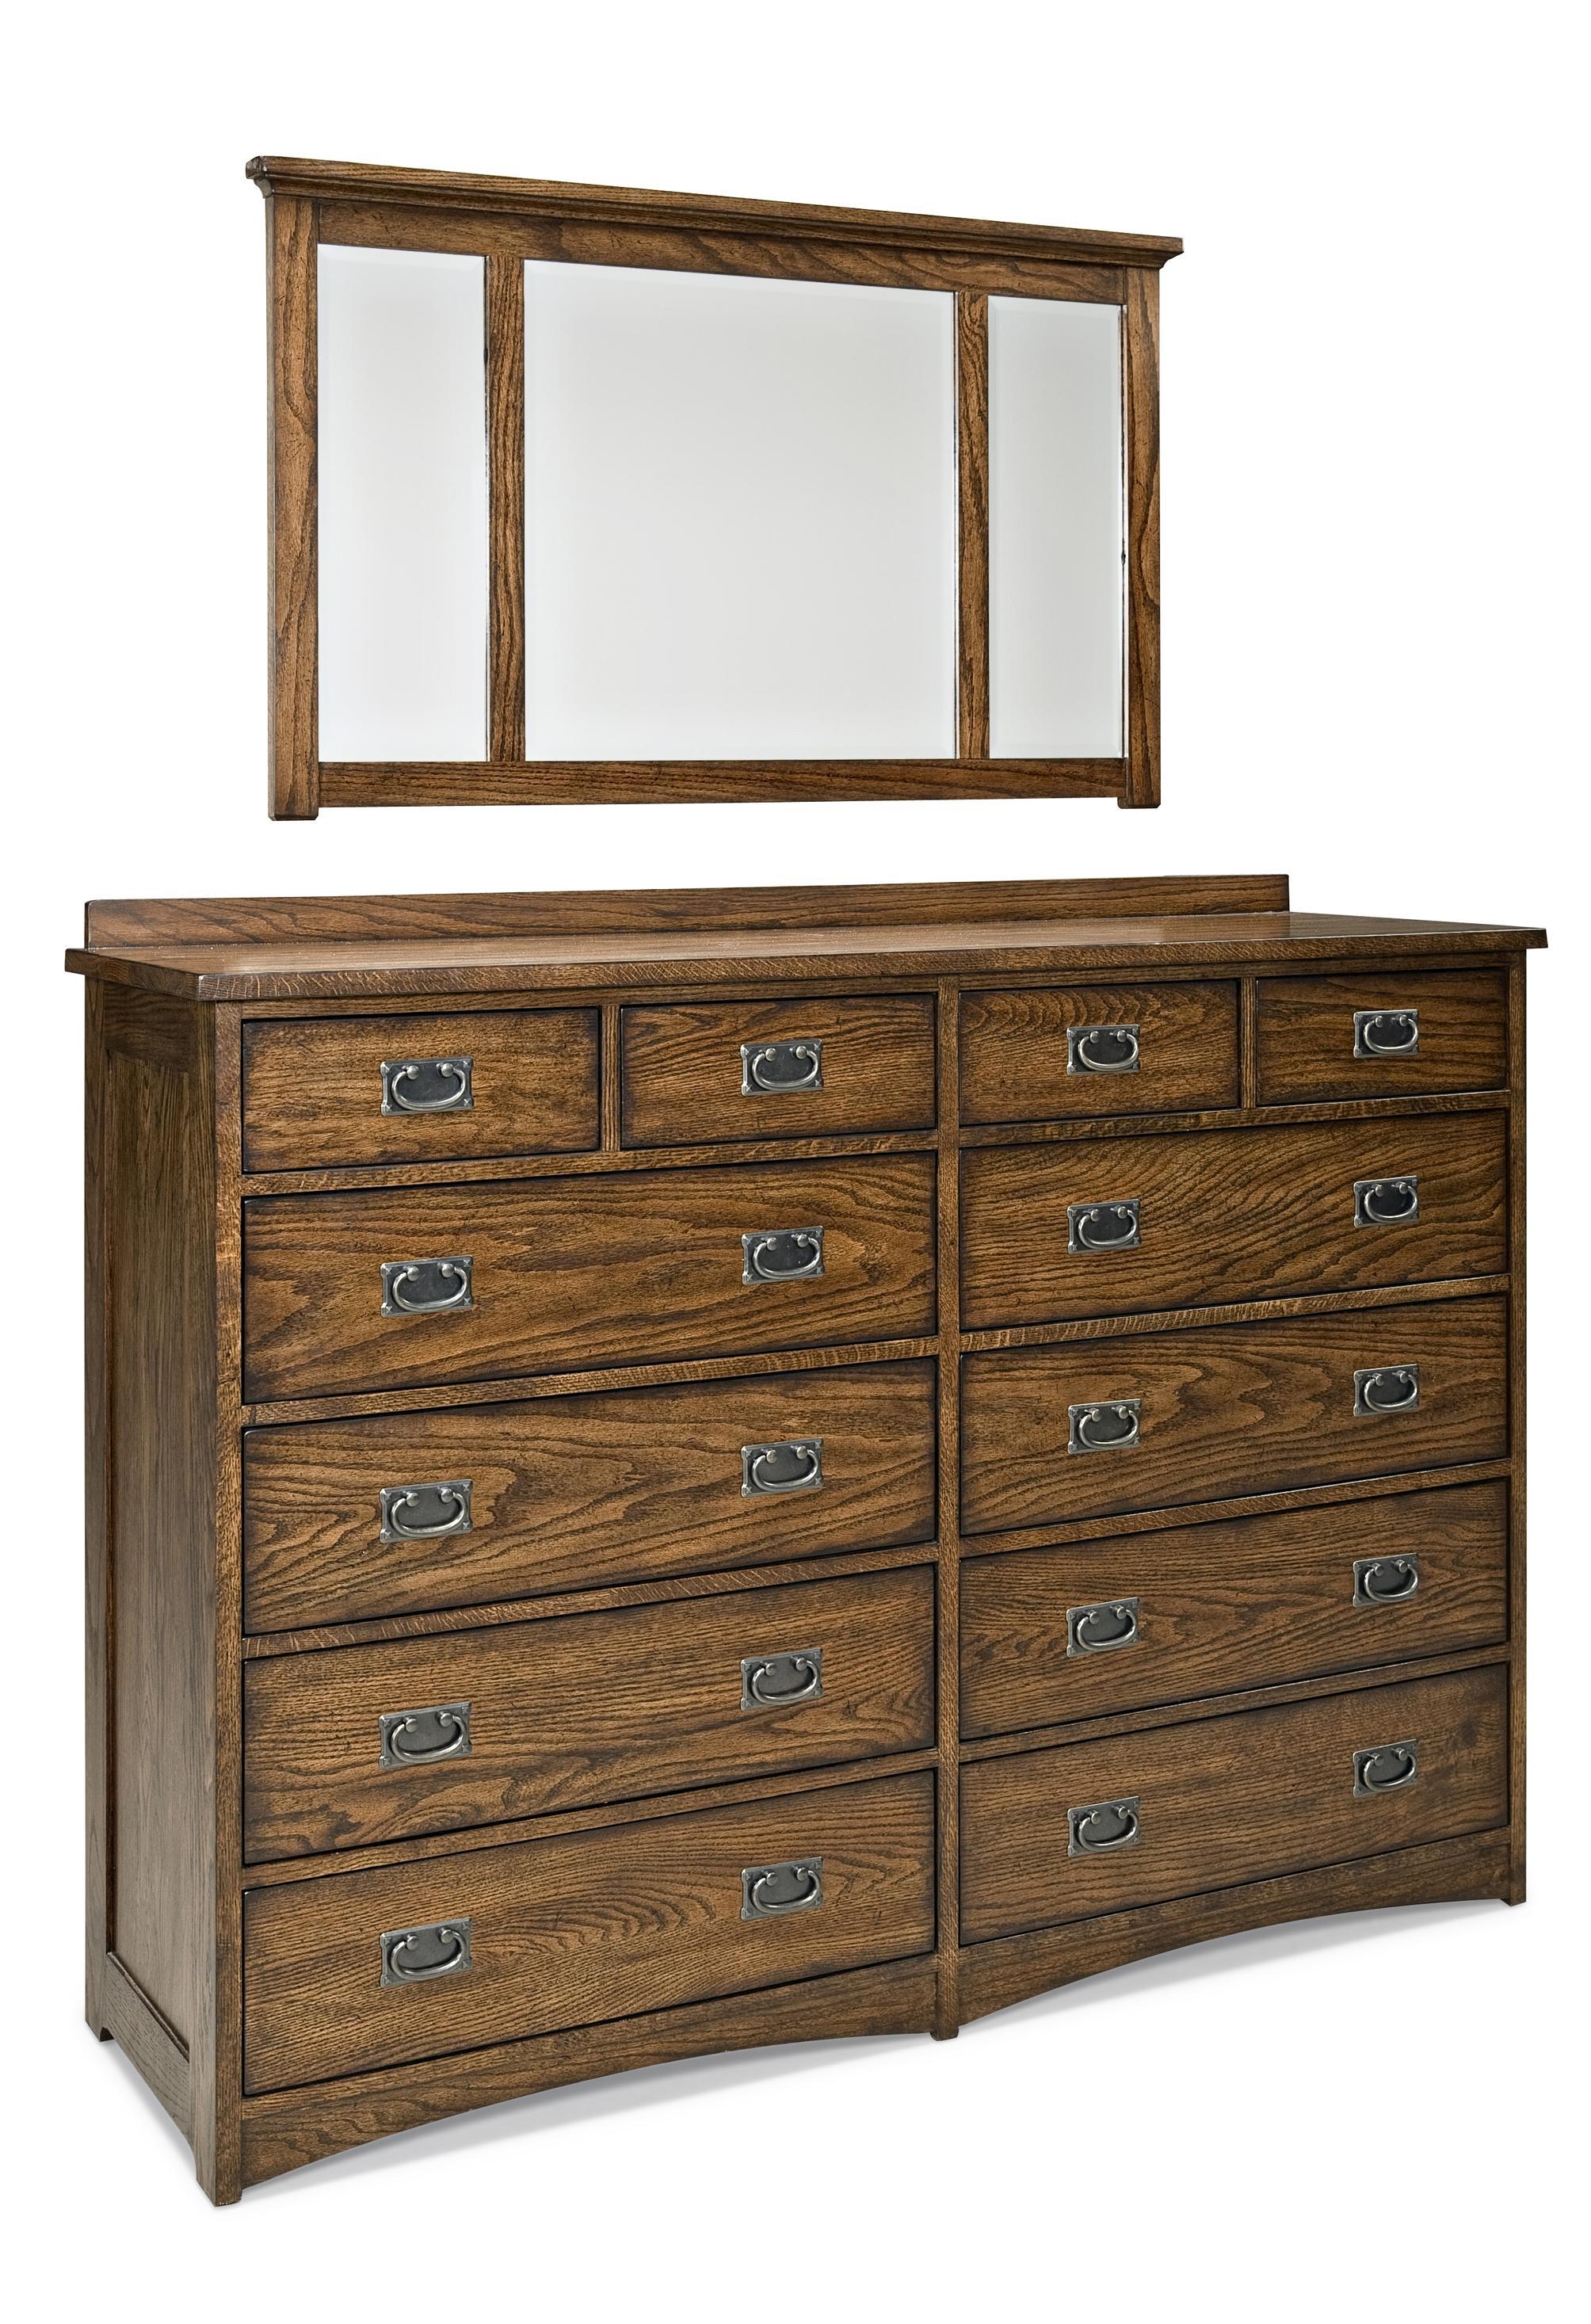 Twelve Drawer Dresser and Mirror Set